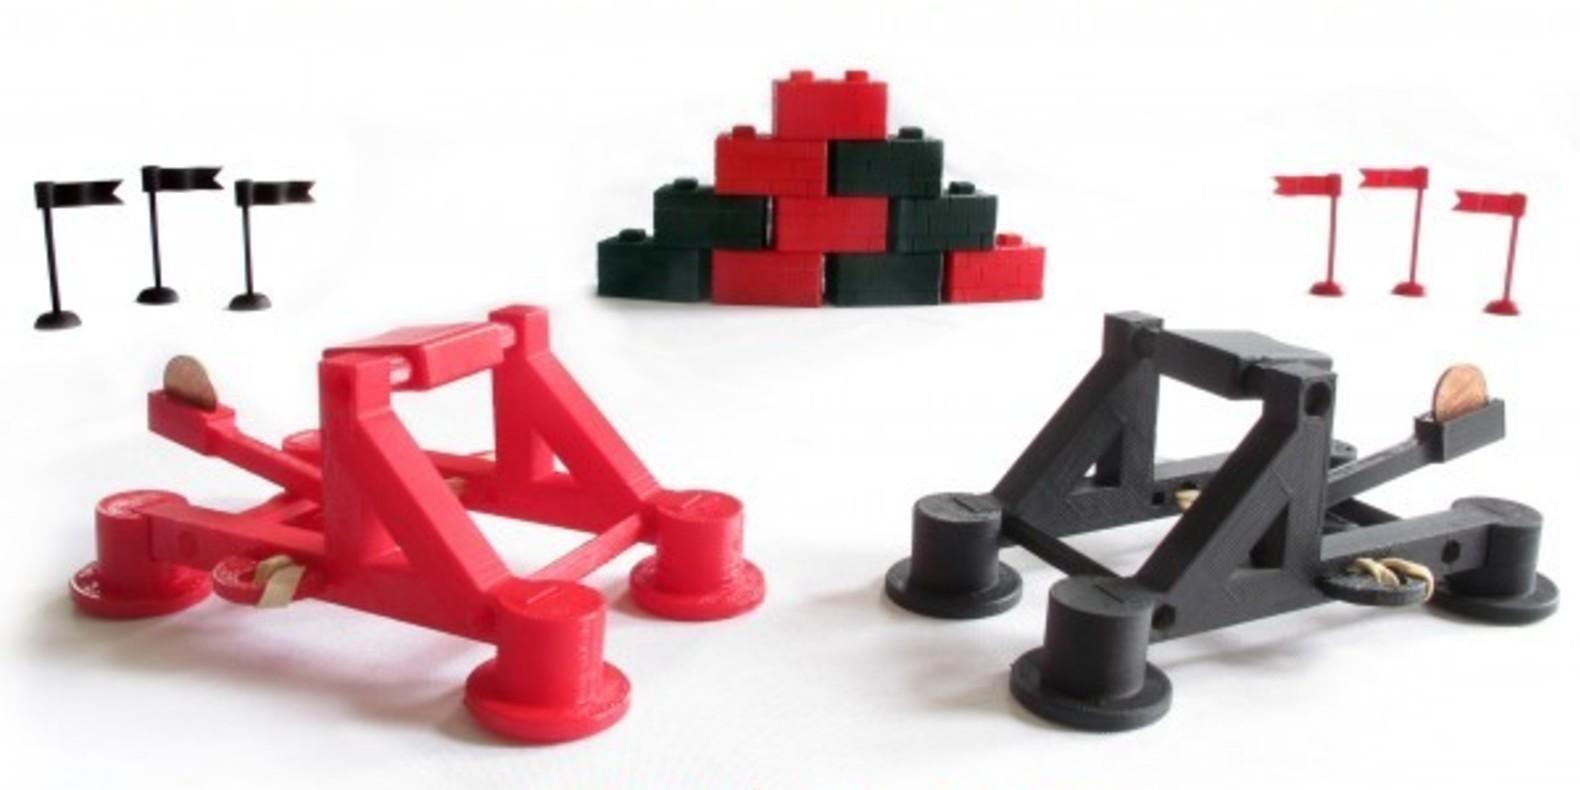 http://fichier3d.fr/wp-content/uploads/2014/01/zheng3-seej-the-forge-fichier-3d-cults-jeu-plateau-catapulte-arme-weapon-block-impression-3d-3D-printing-fun-games-11-e1389265417279.jpg